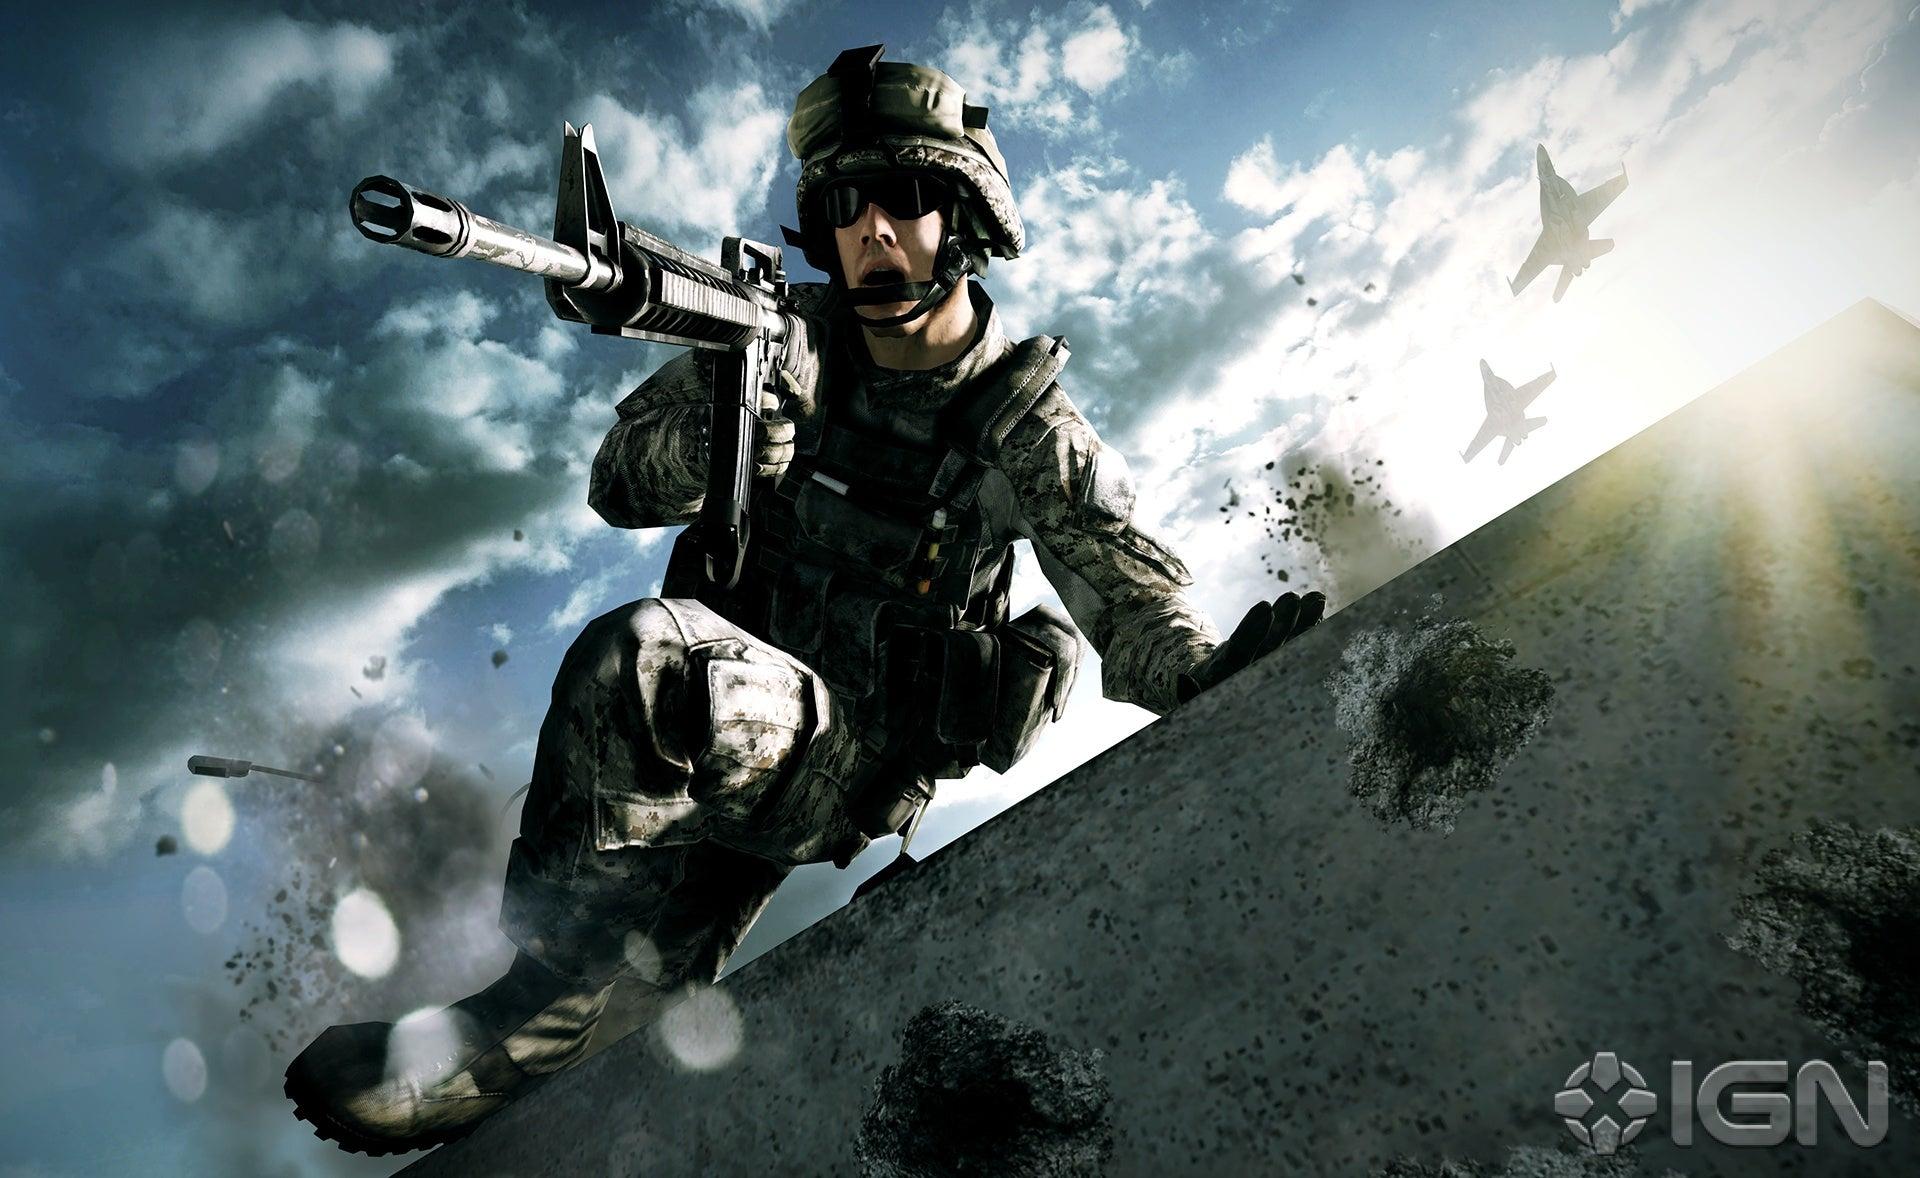 https://i1.wp.com/pcmedia.ign.com/pc/image/article/119/1194679/battlefield-3-20110915101741491.jpg